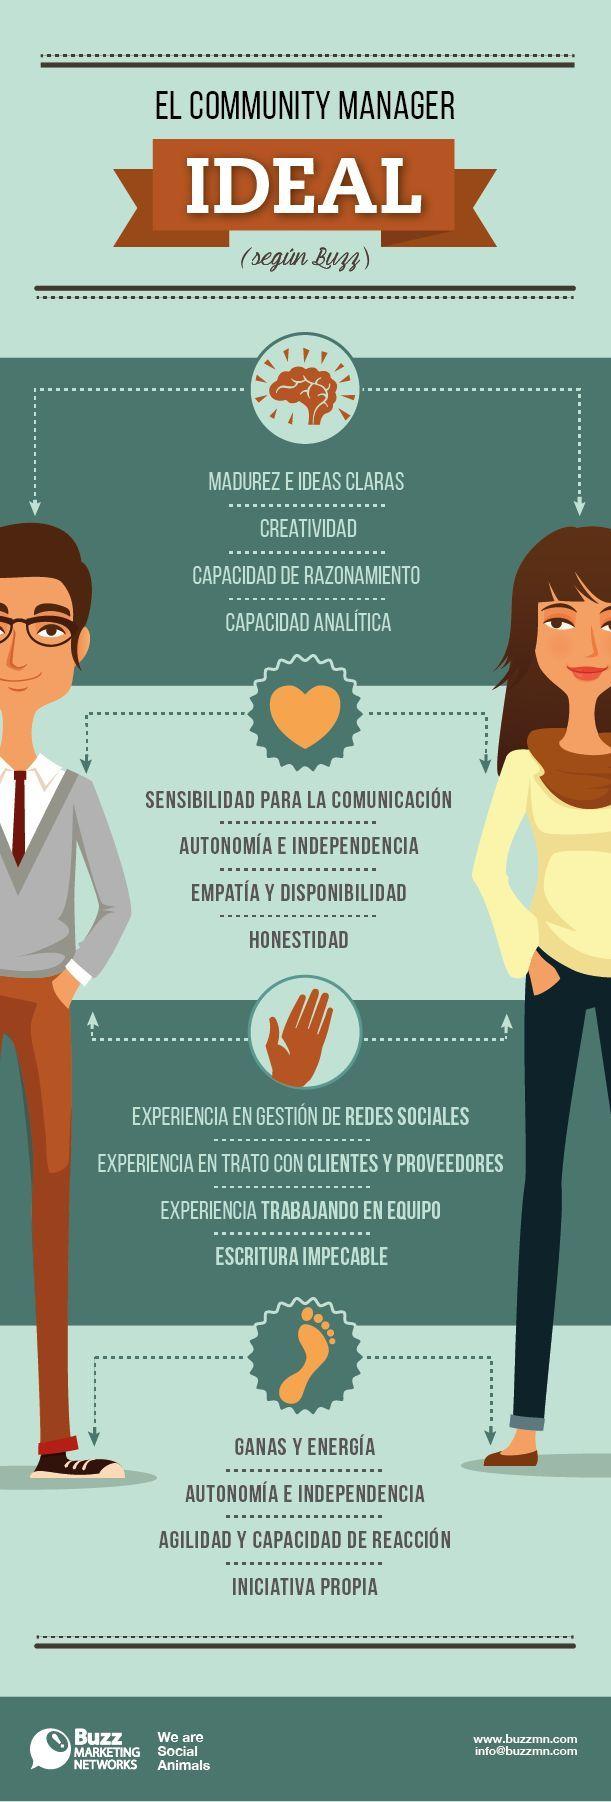 El Community Manager Ideal #Infografía